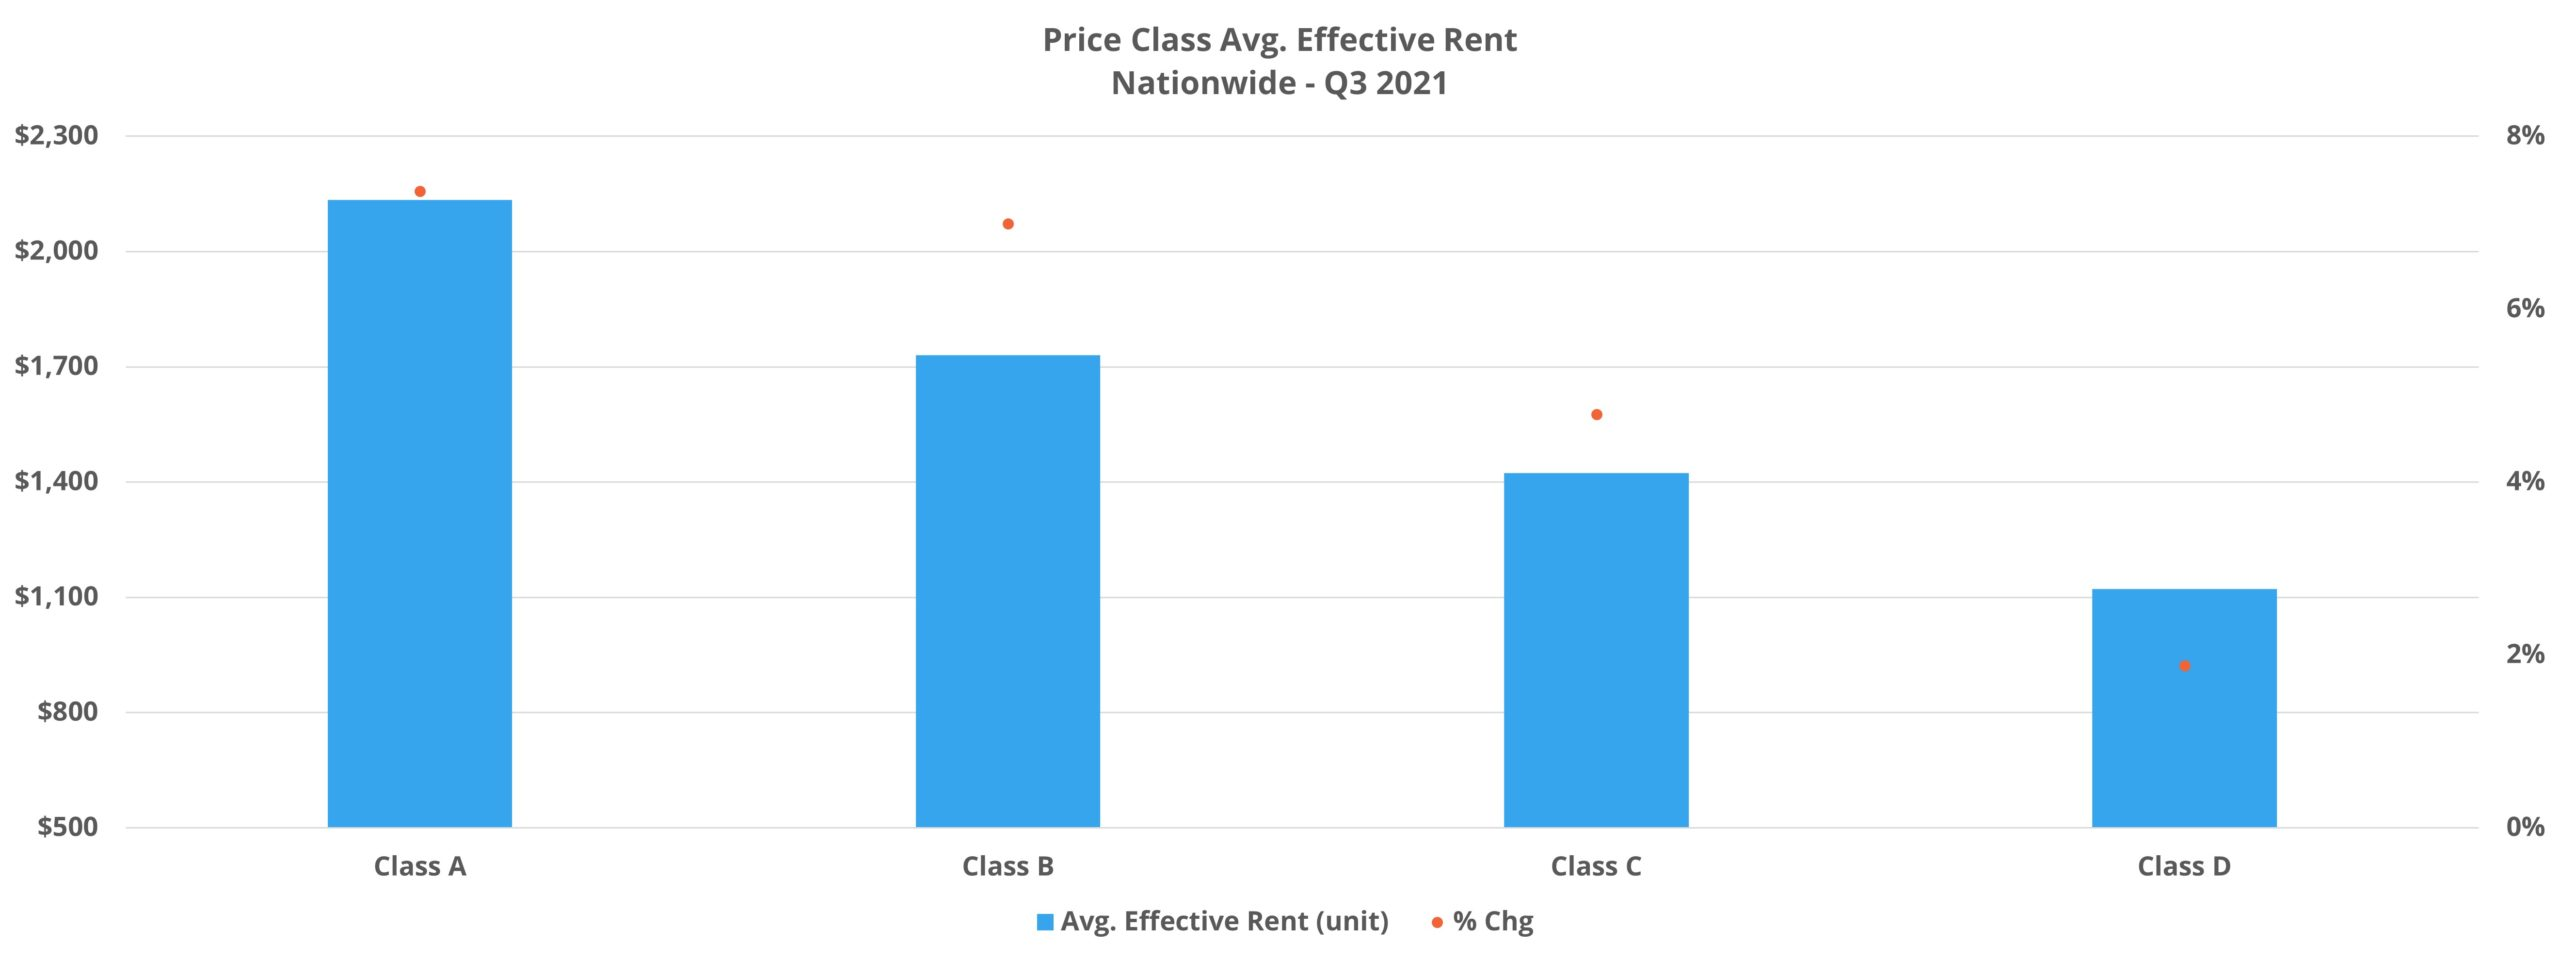 Price Class Avg. Effective Rent